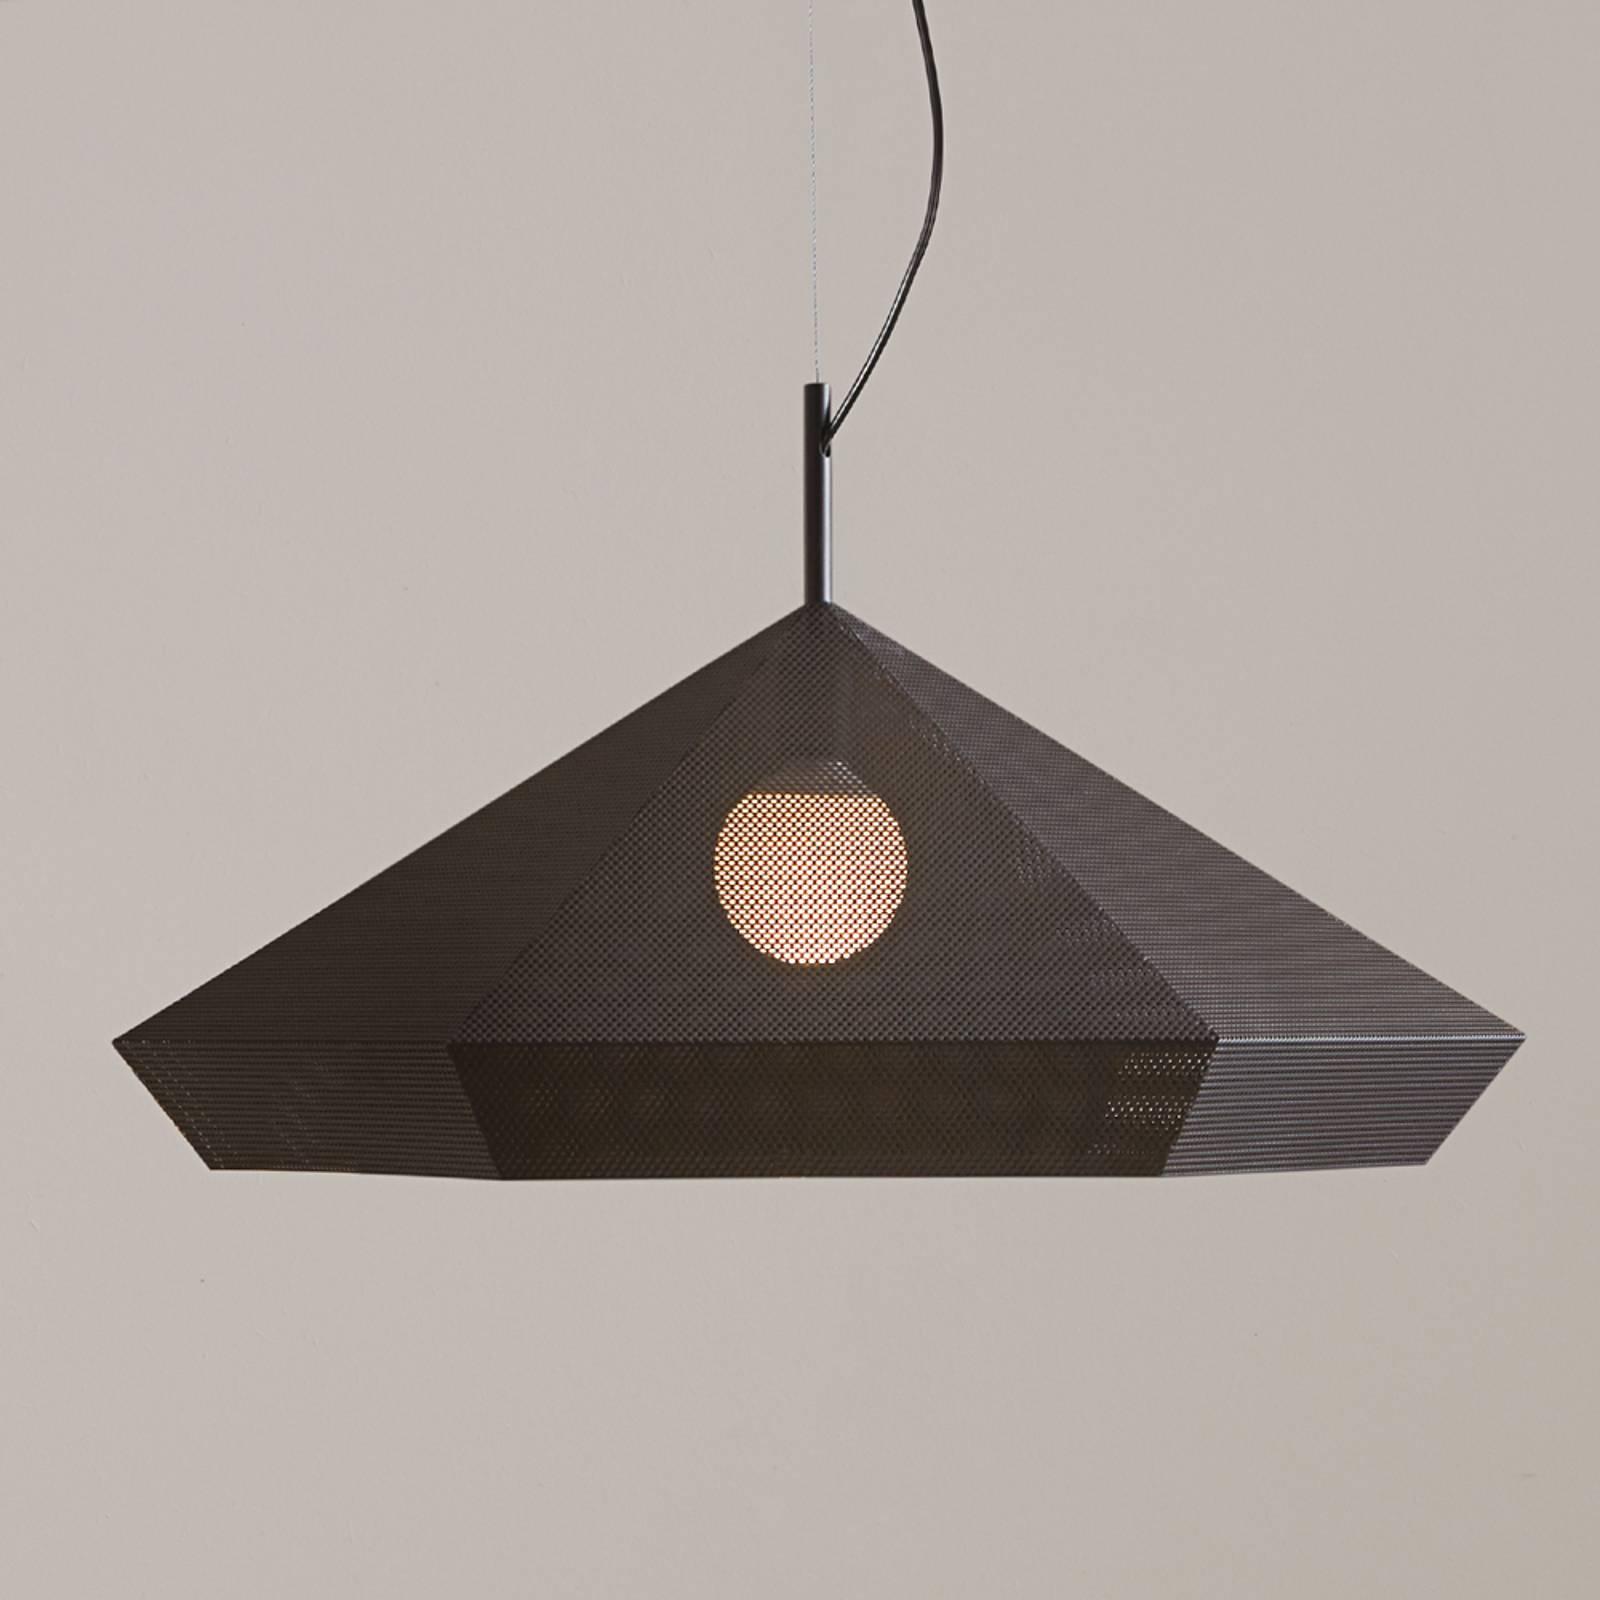 Priamo design-riippuvalaisin, musta, 77 cm